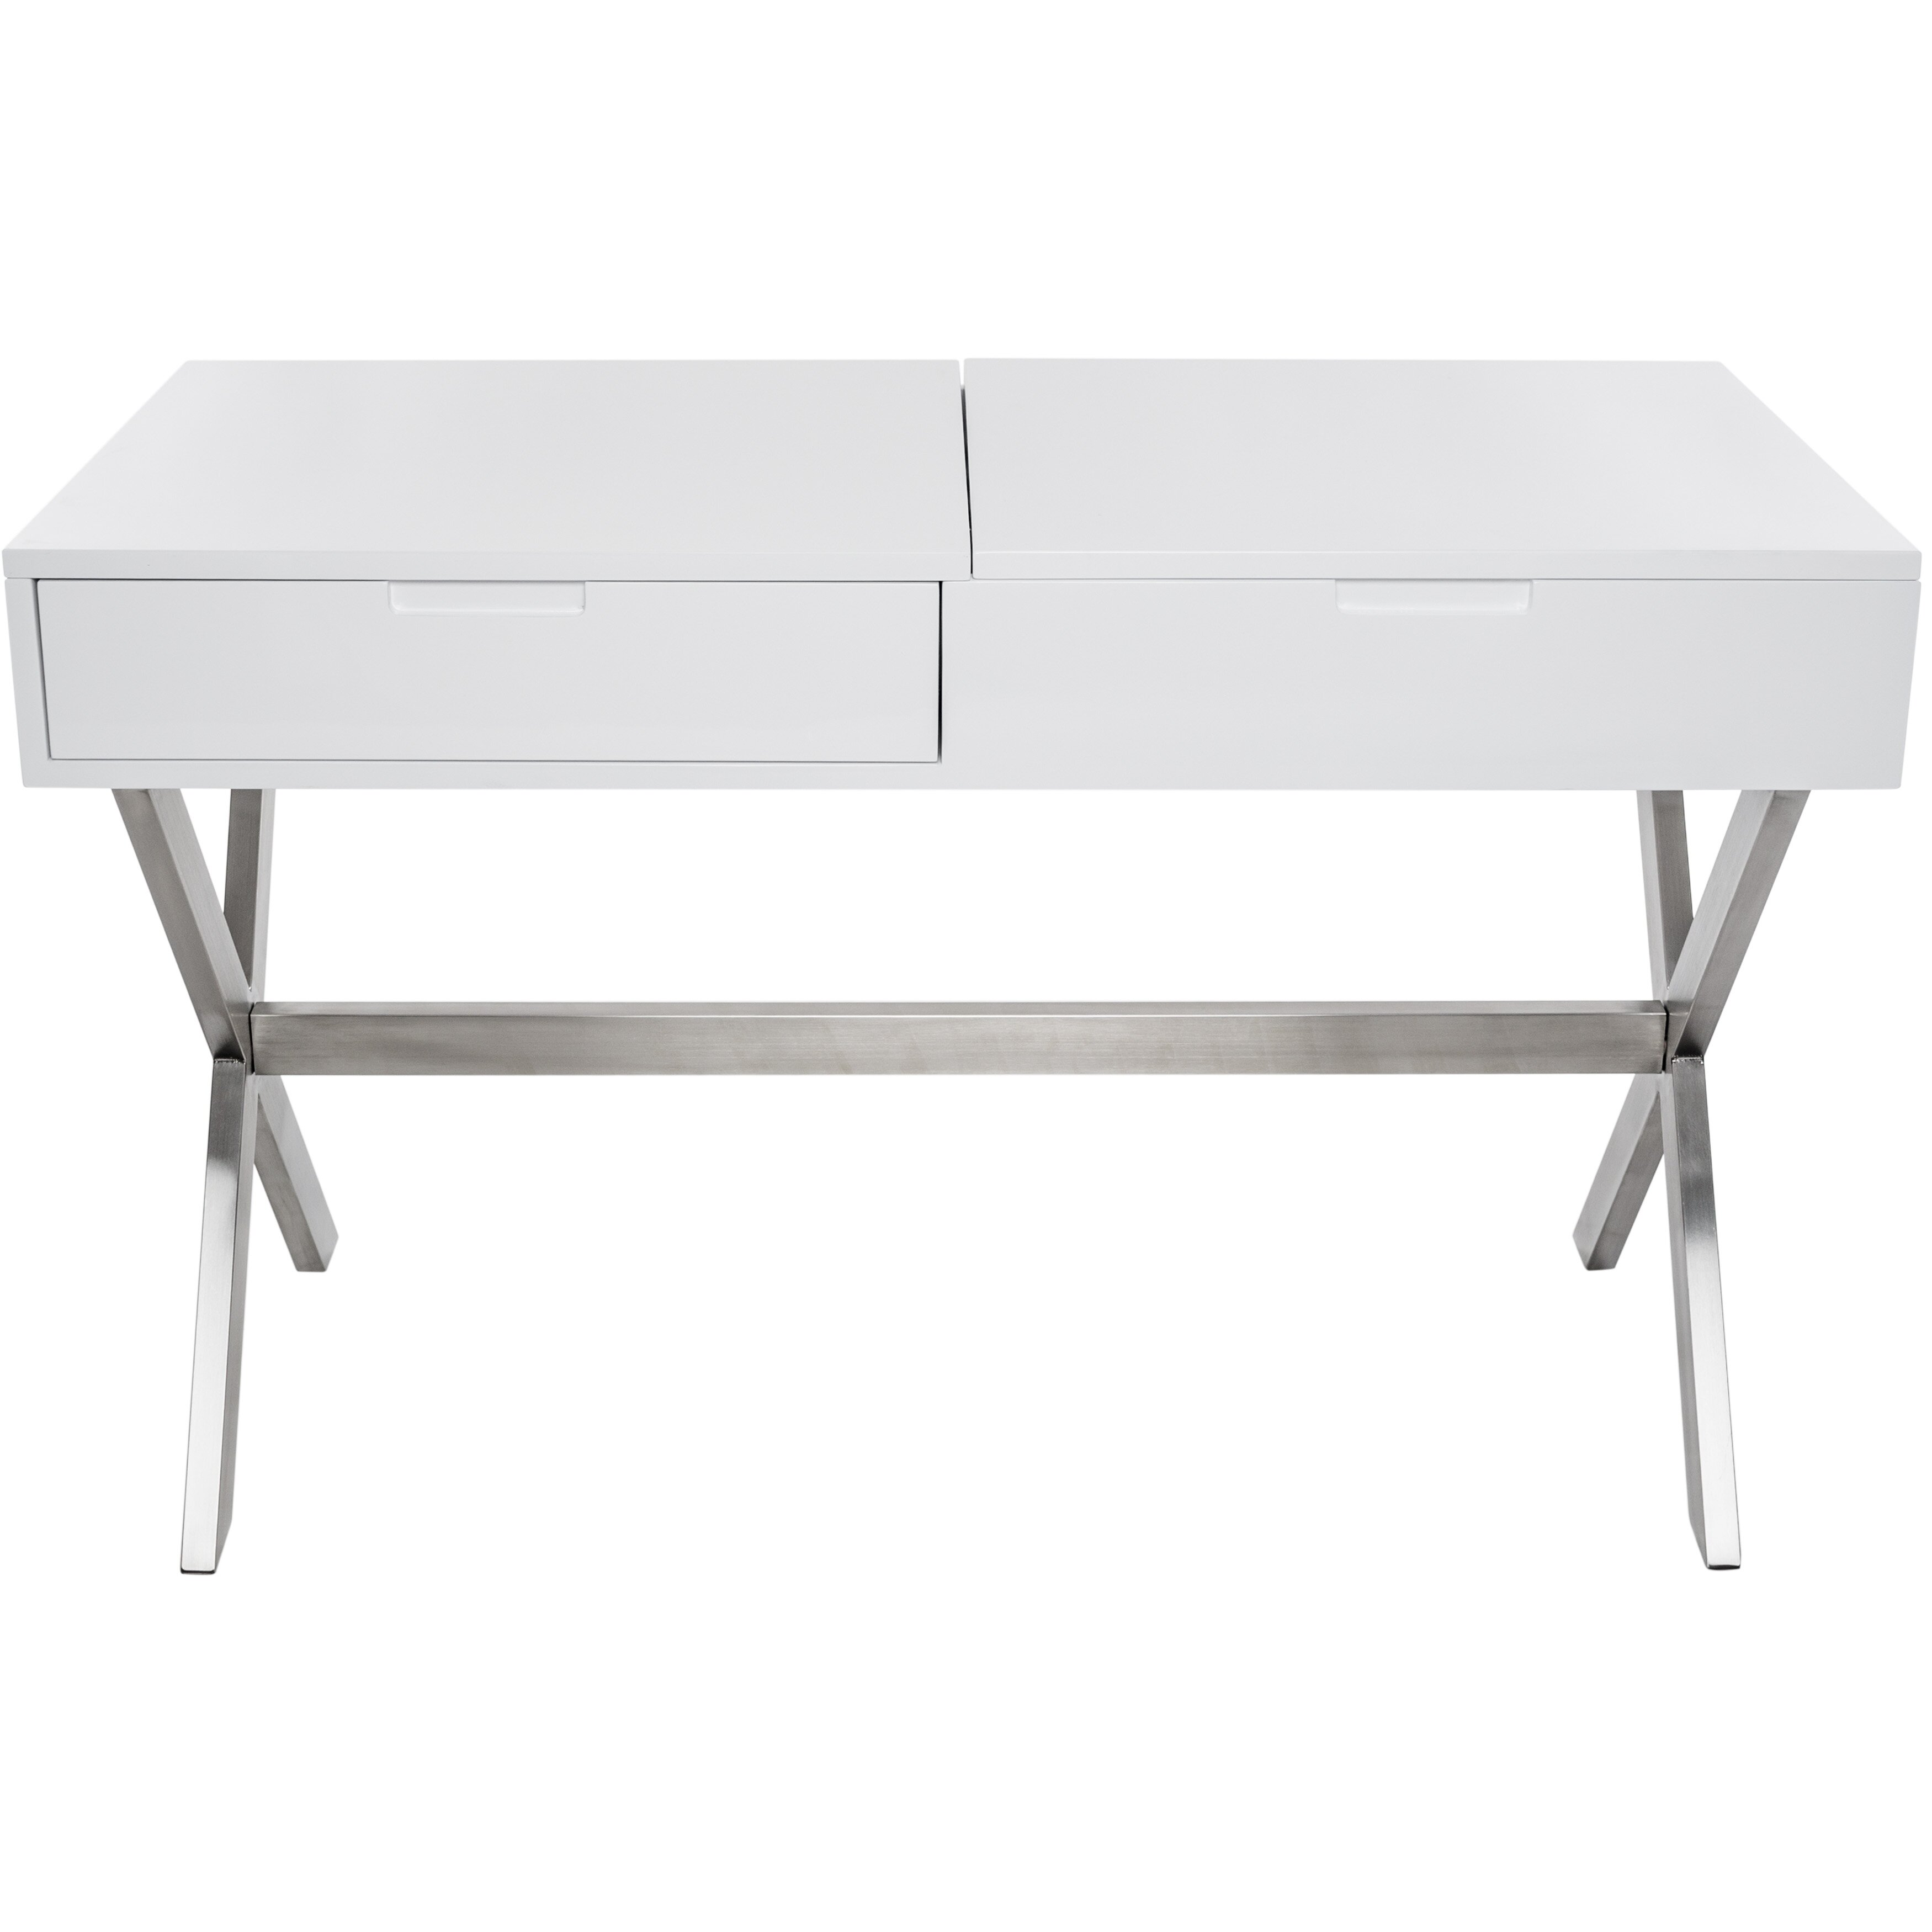 Matrix porsha desk vanity set with mirror reviews wayfair for Vanity desk set